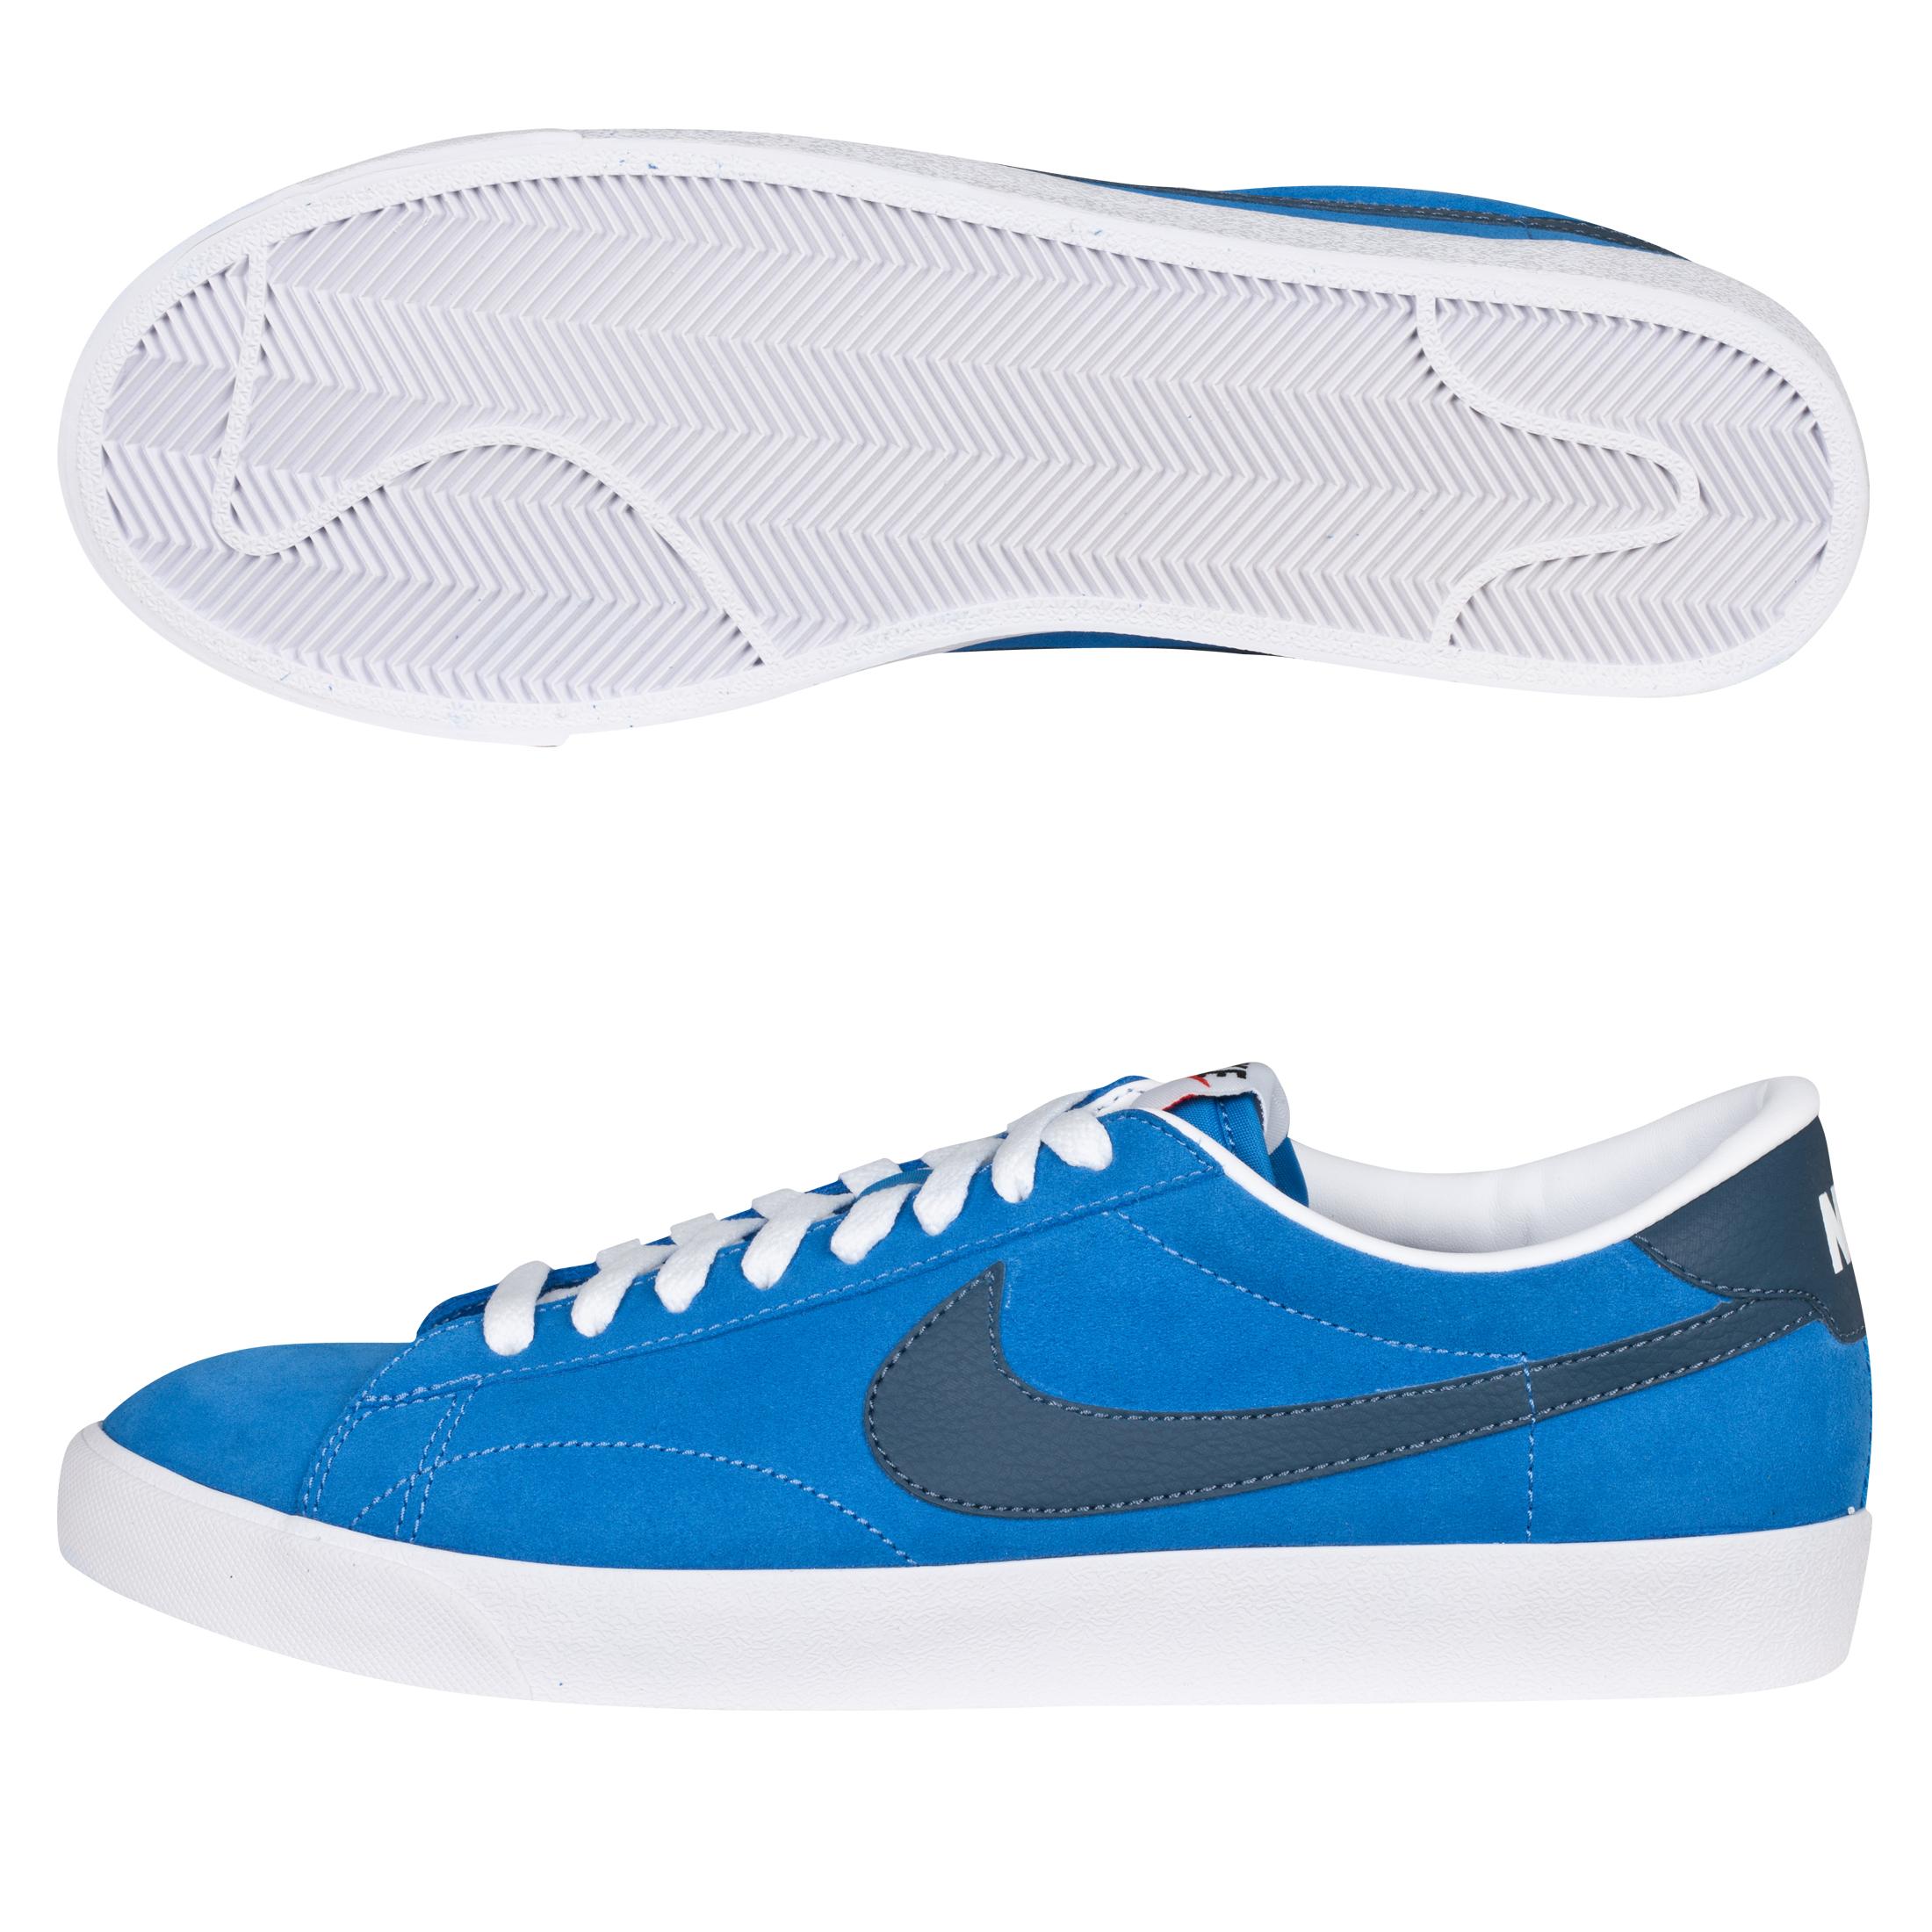 Nike Tennis Classic AC Suede Trainer - Photo Blue/Squadron Blue